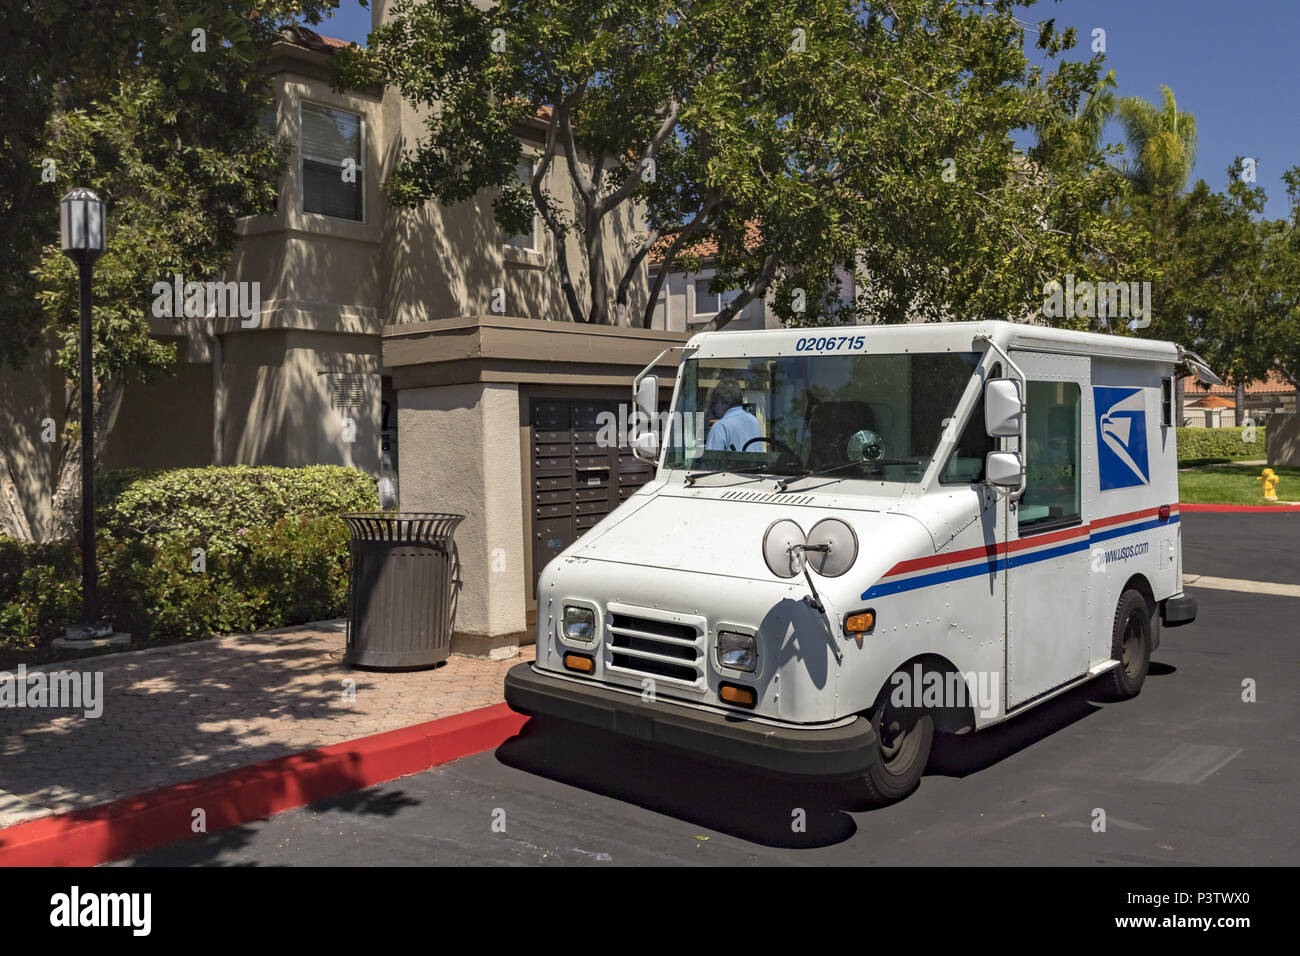 Irvine, California, USA. 10th May, 2018. Post car Credit: Alexey Bychkov/ZUMA Wire/Alamy Live News - Stock Image